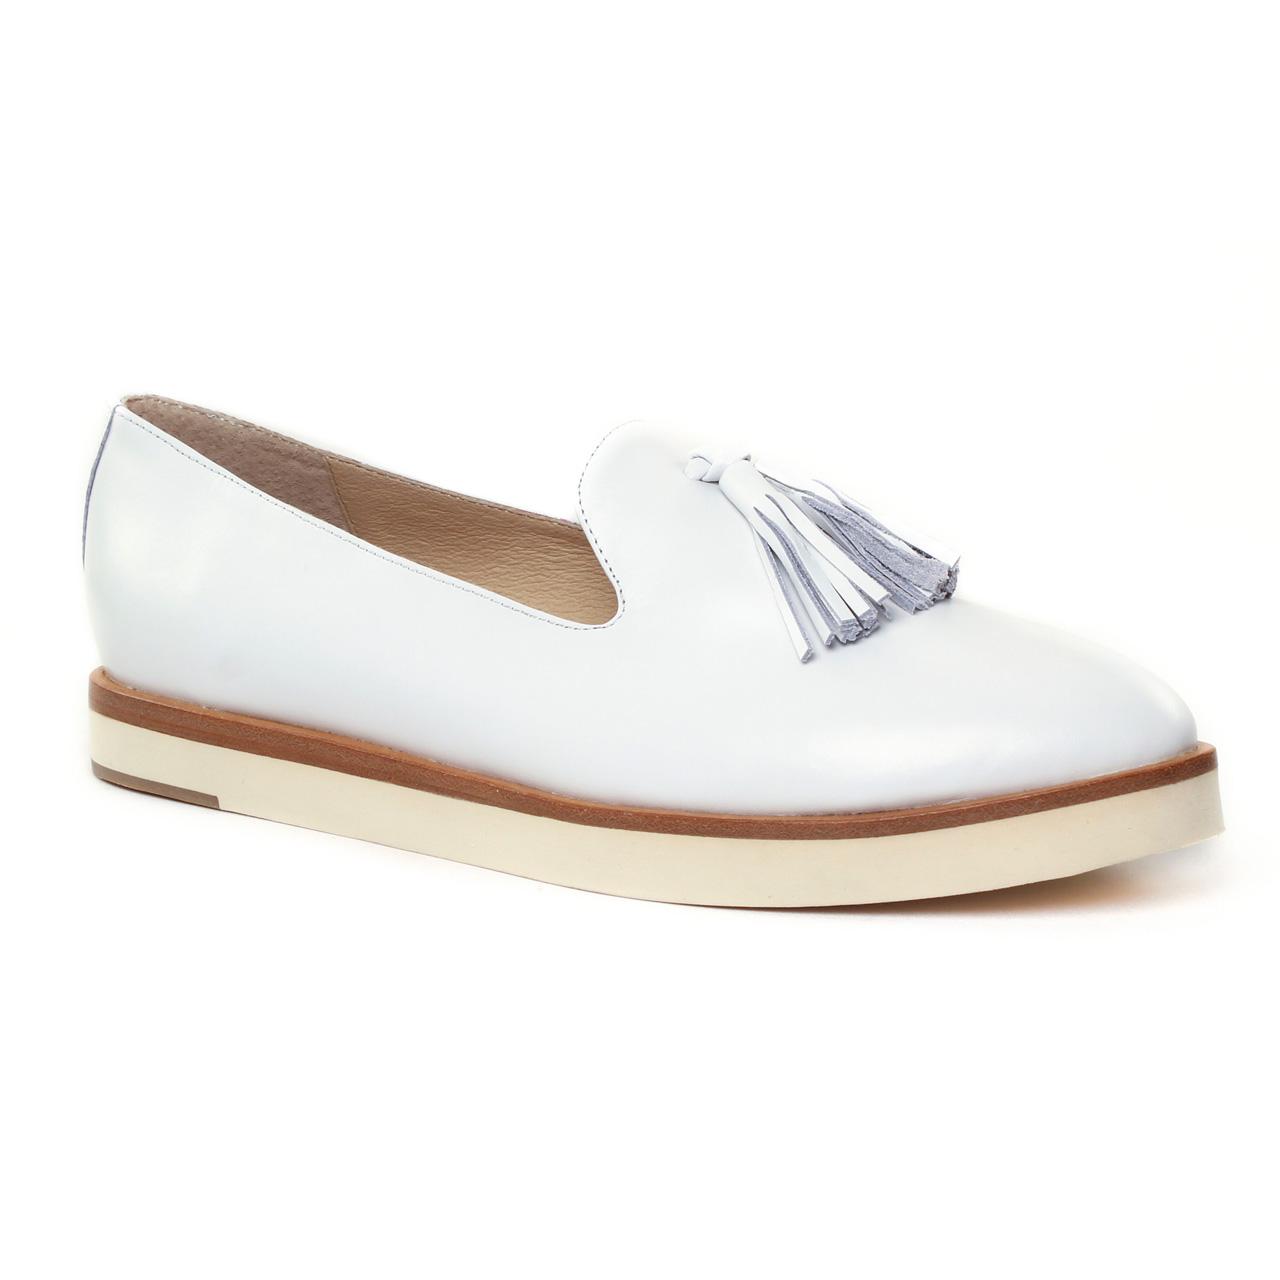 jb martin 1darleen blanc mocassin slippers blanc printemps t chez trois par 3. Black Bedroom Furniture Sets. Home Design Ideas